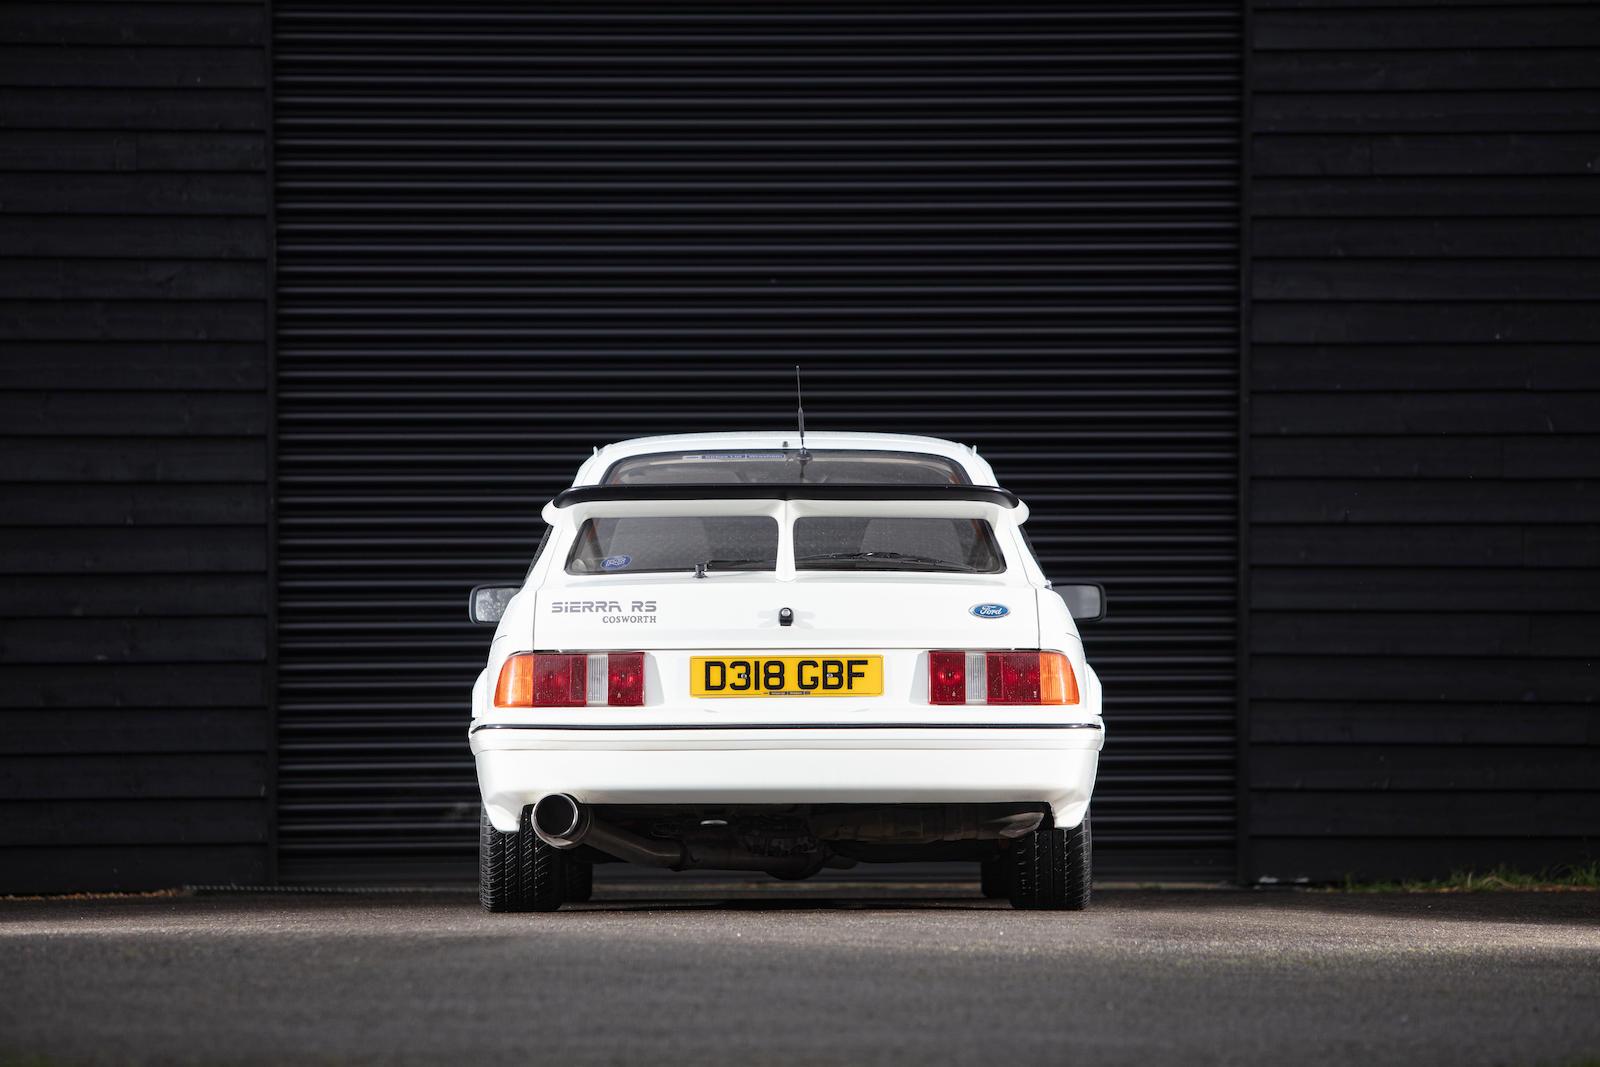 1987 Ford Sierra RS Cosworth Rear